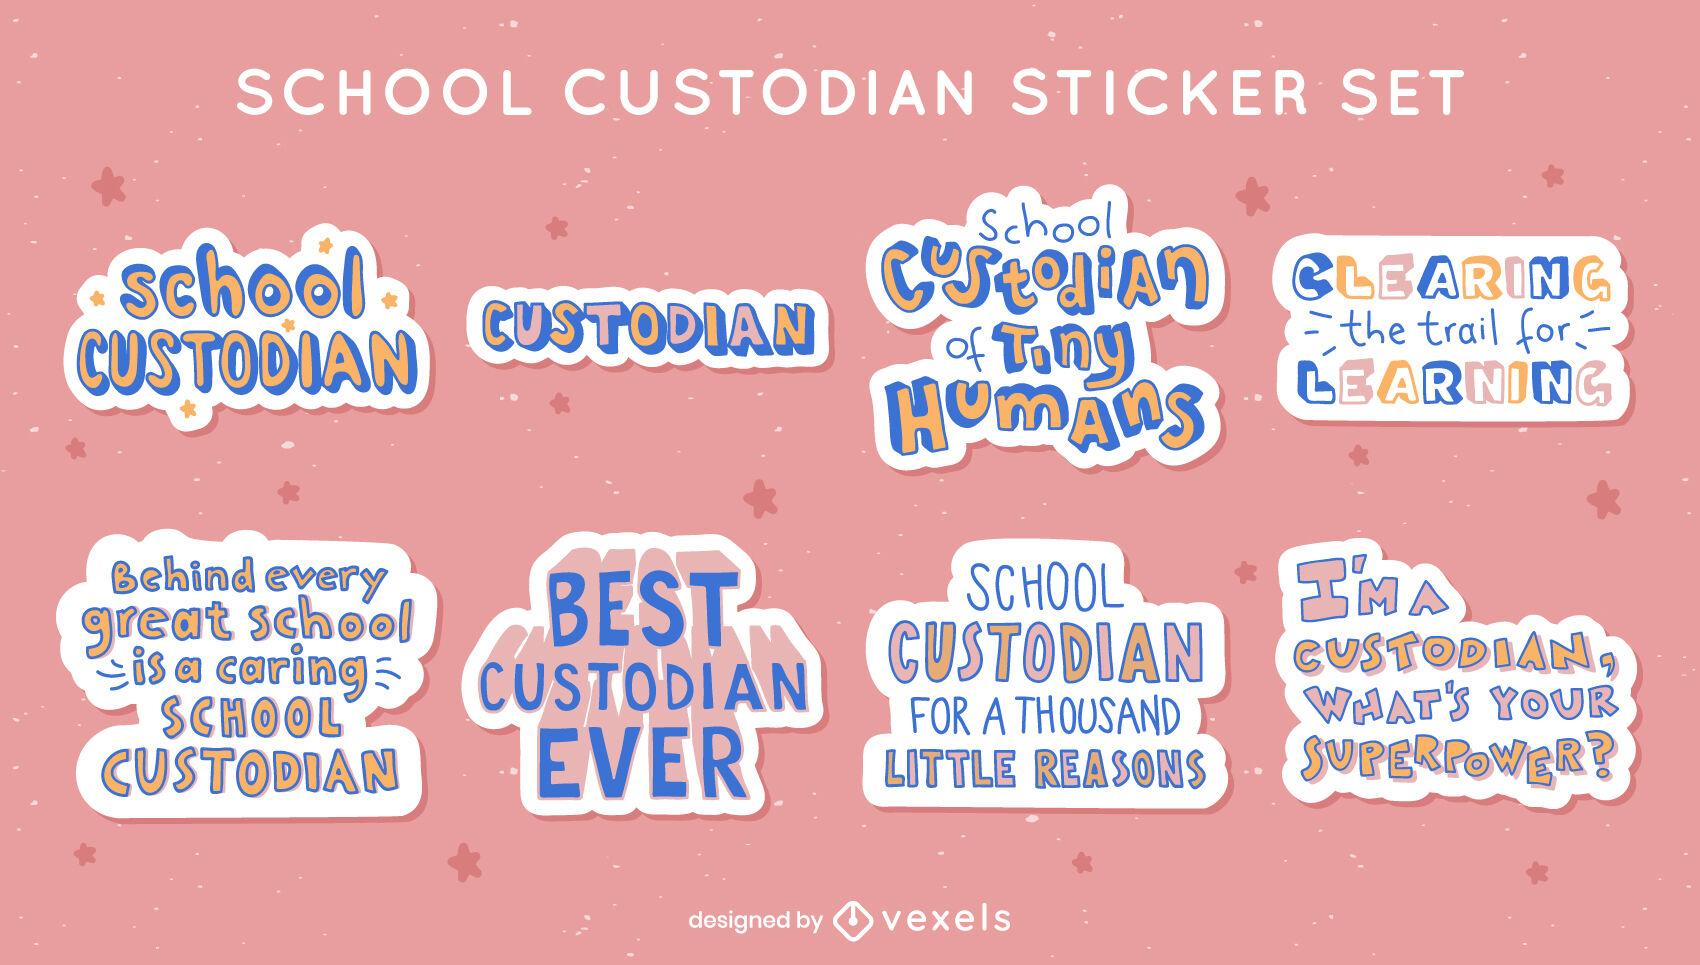 School teacher custodian sticker set